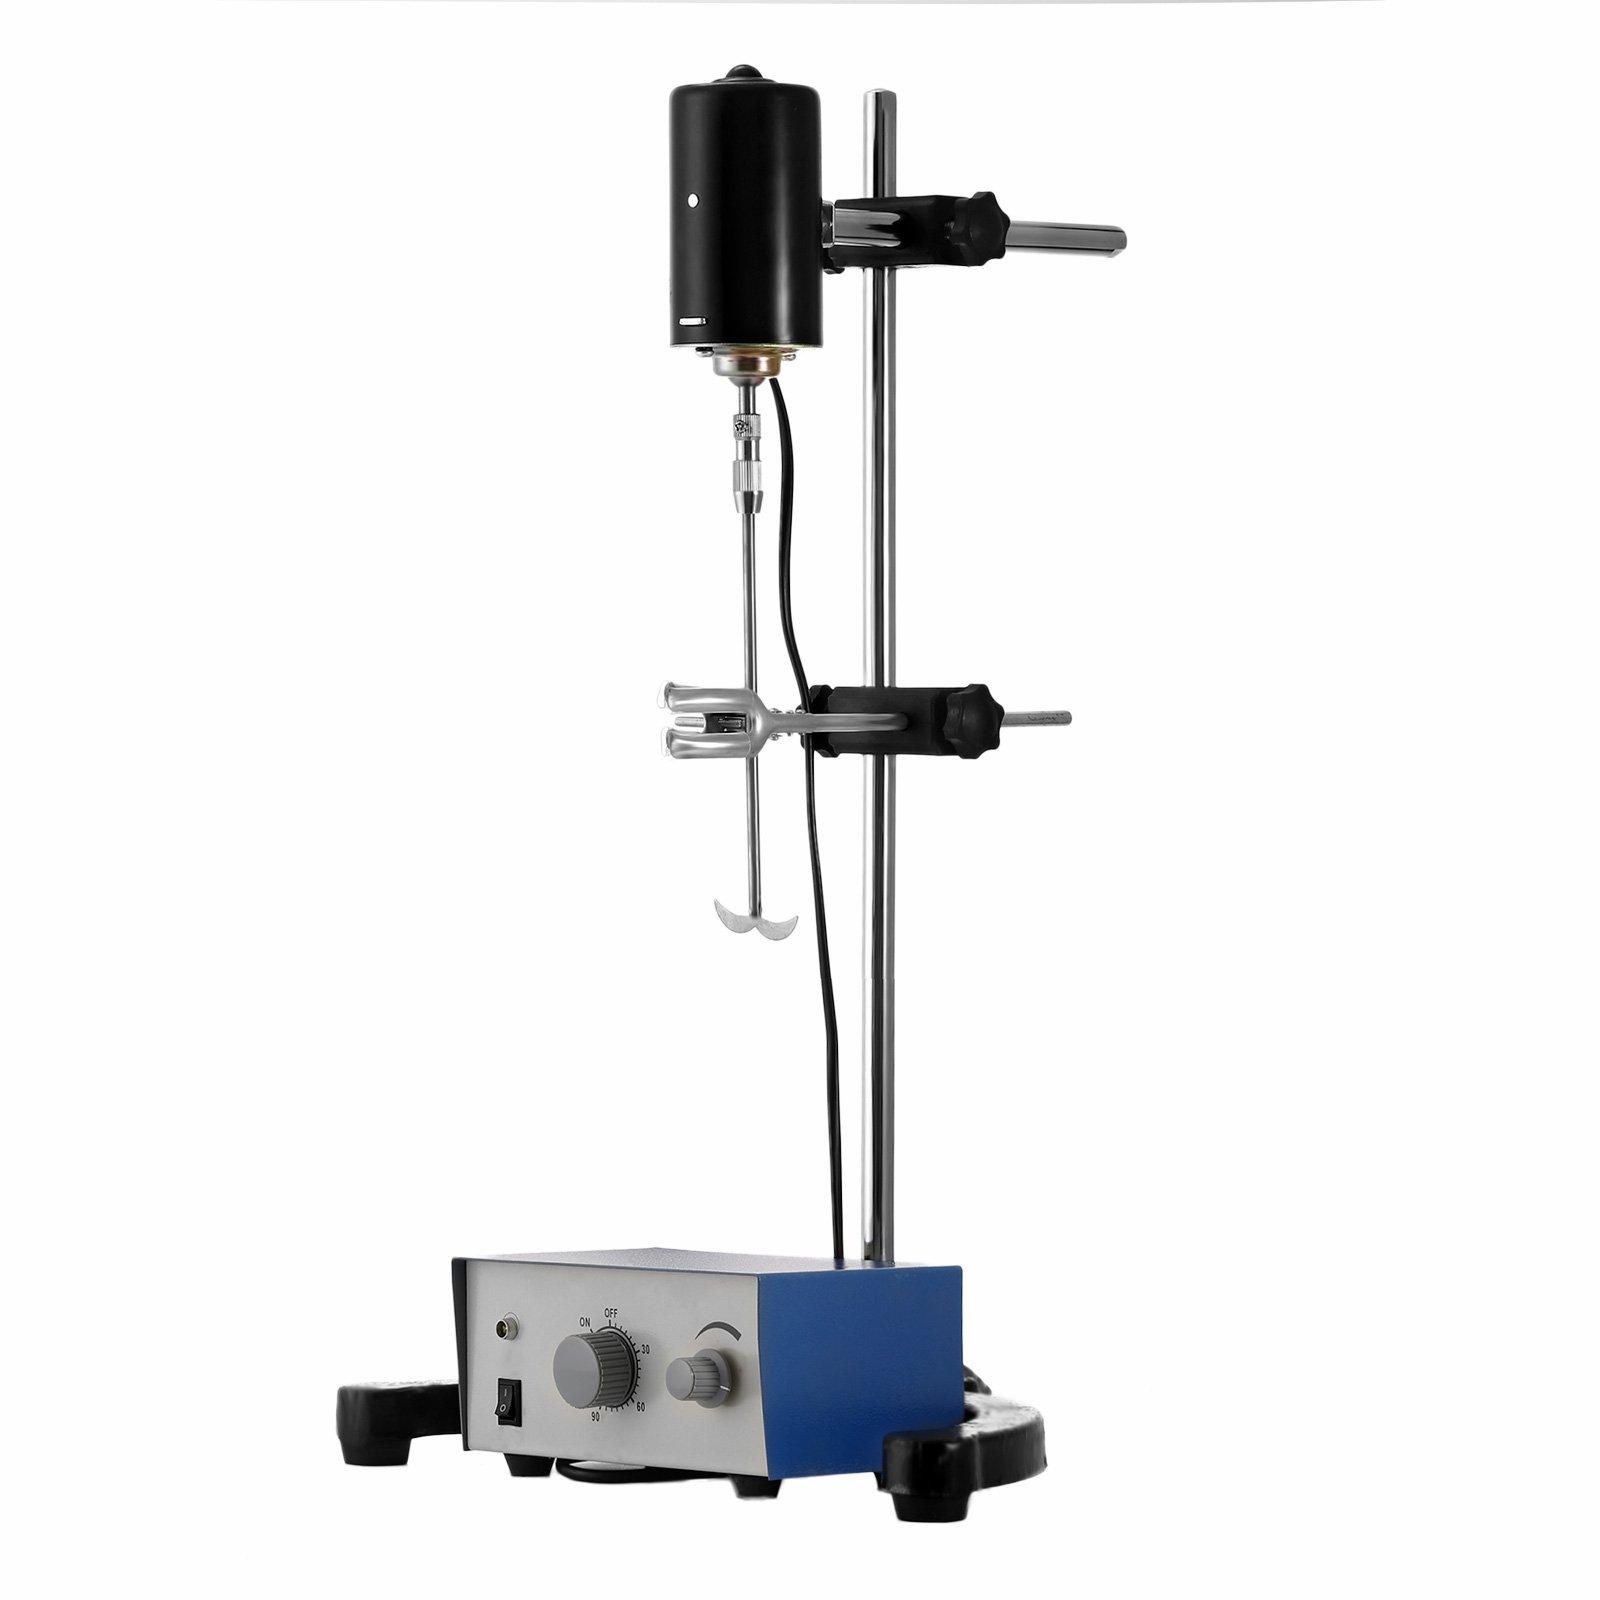 Mophorn Electric Overhead Stirrer Mixer 0-2000 RPM Overhead Stirrer Mixer 100W Lab Mixer Blender Variable Speed 0-120 Minutes Overhead Stirrer by Mophorn (Image #2)